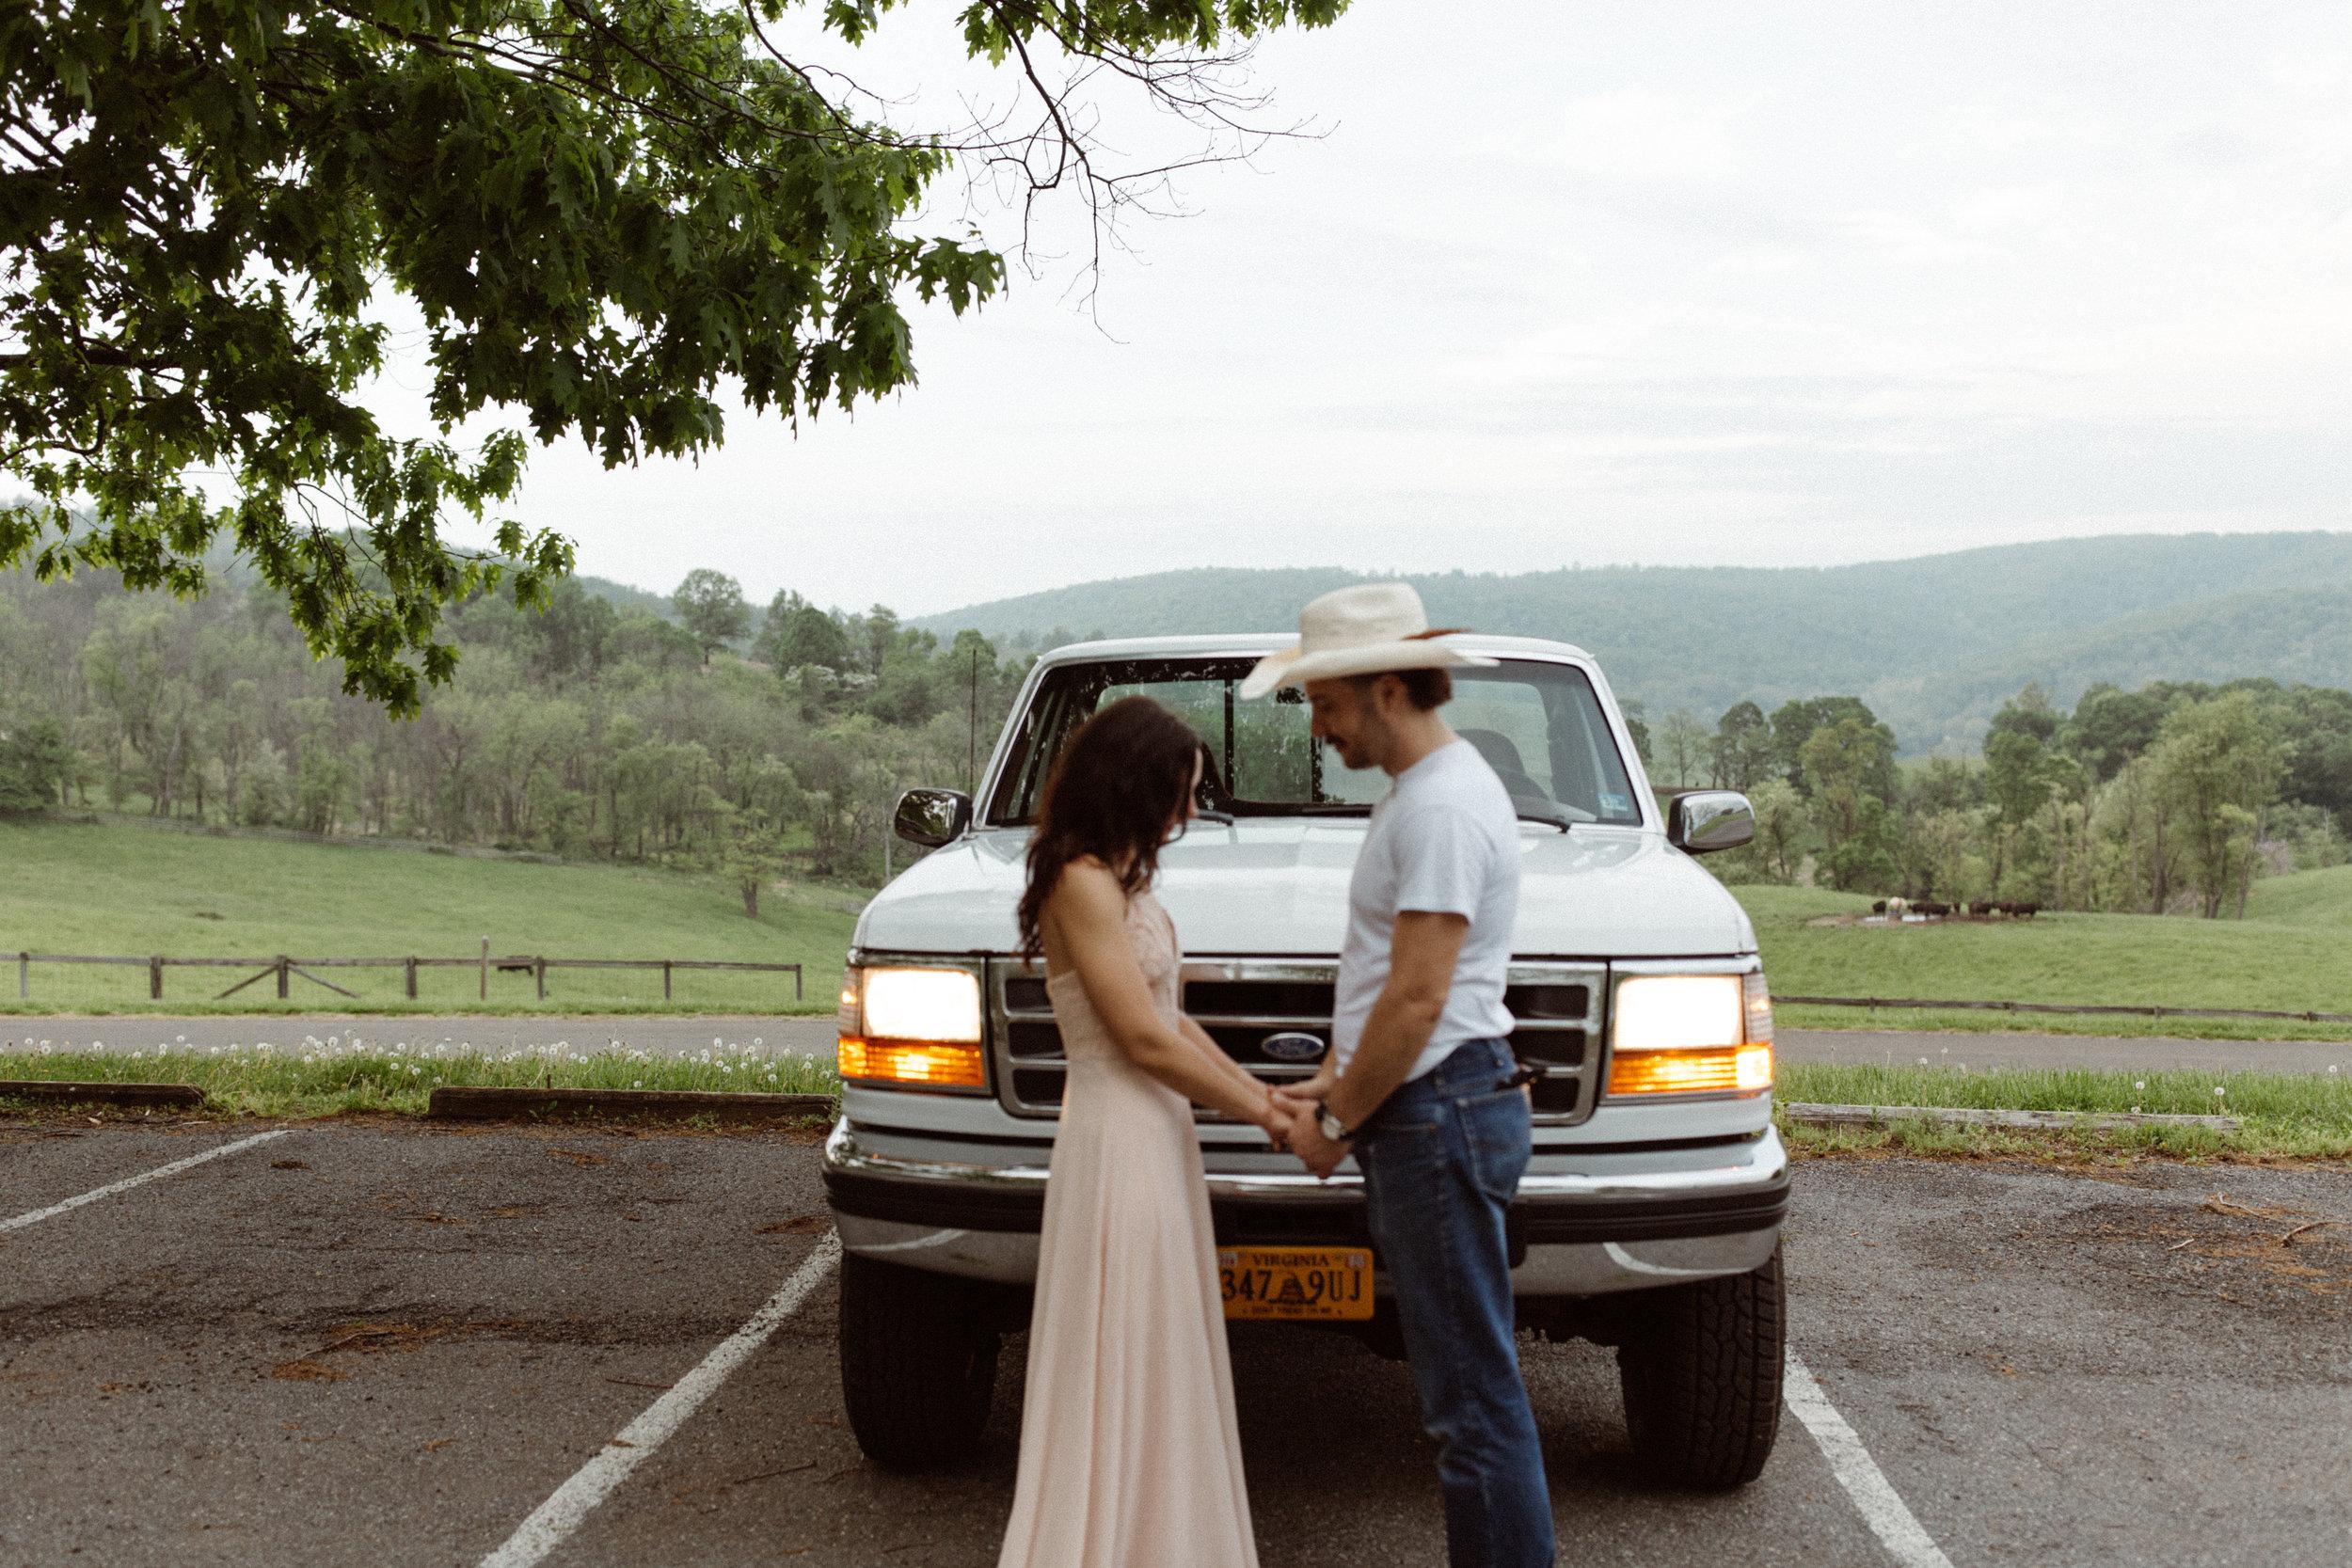 kelsey&mark-engagement-skymeadows-2019-peytoncurry-0247.jpg